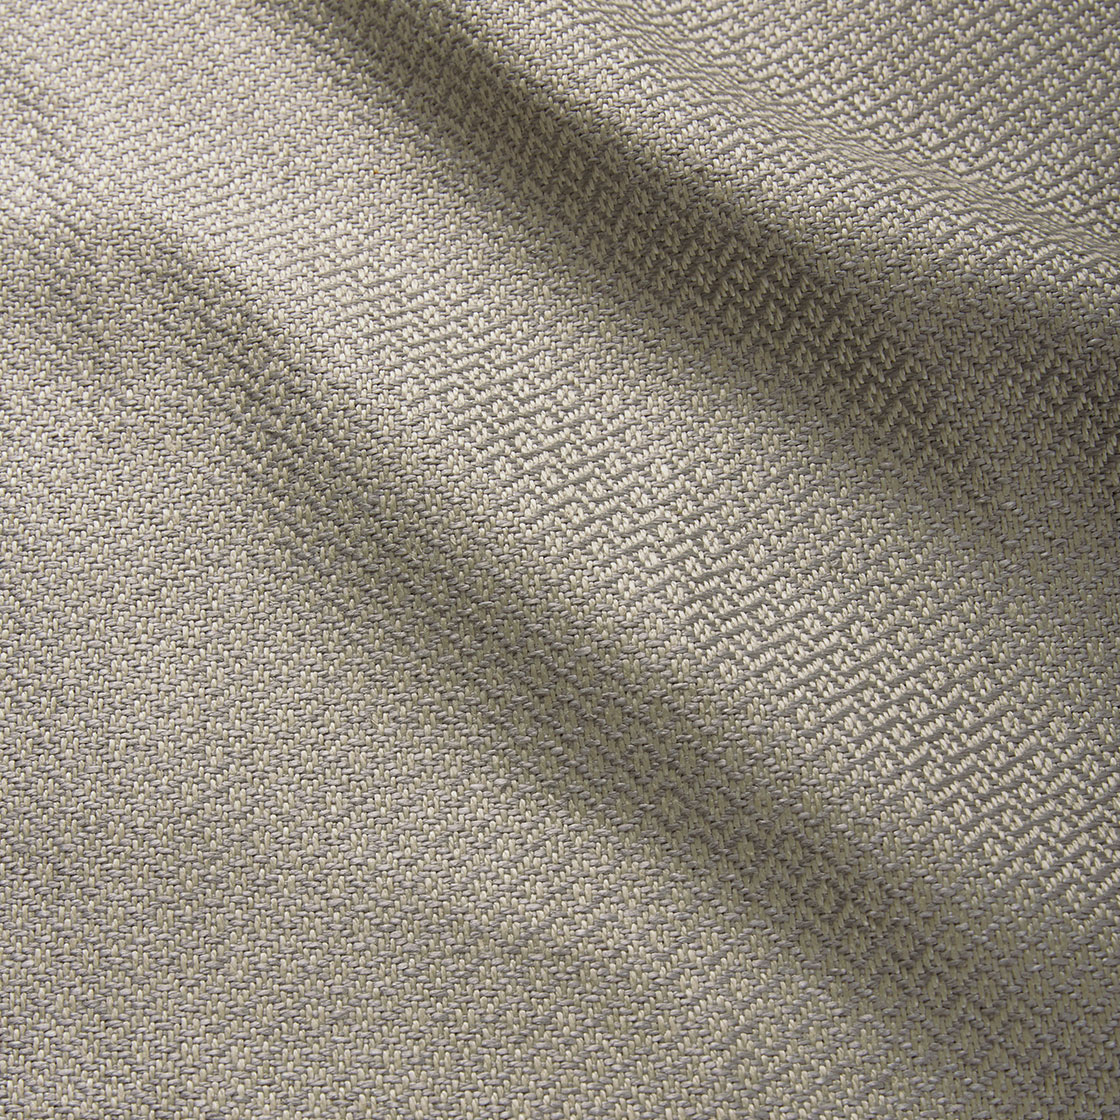 Piedmont Linen - Pearl Grey - Beaumont & Fletcher - Beaumont & Fletcher